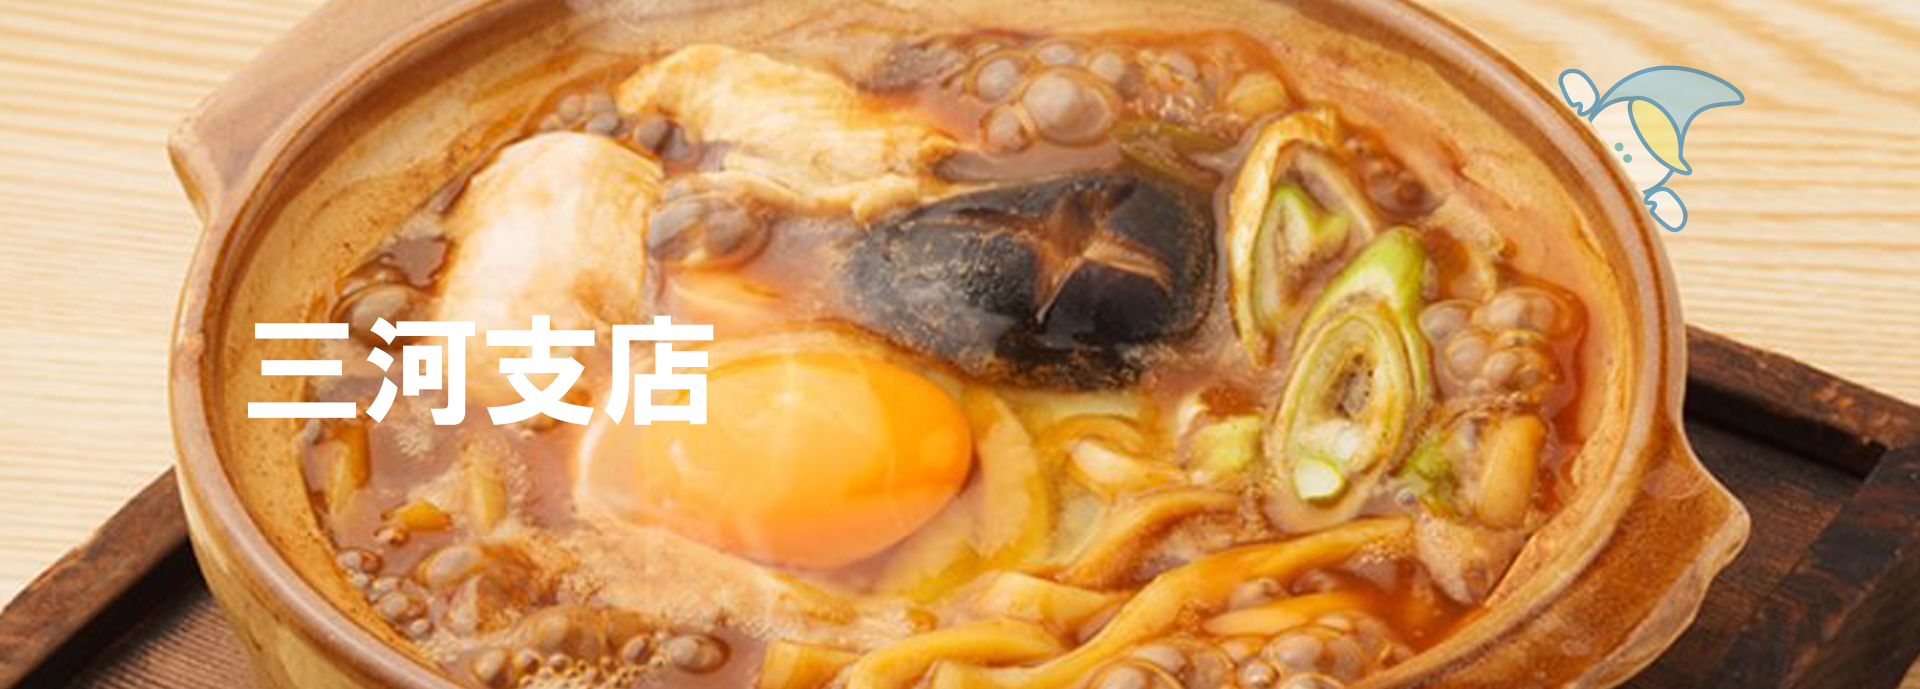 RC三河支店.jpg